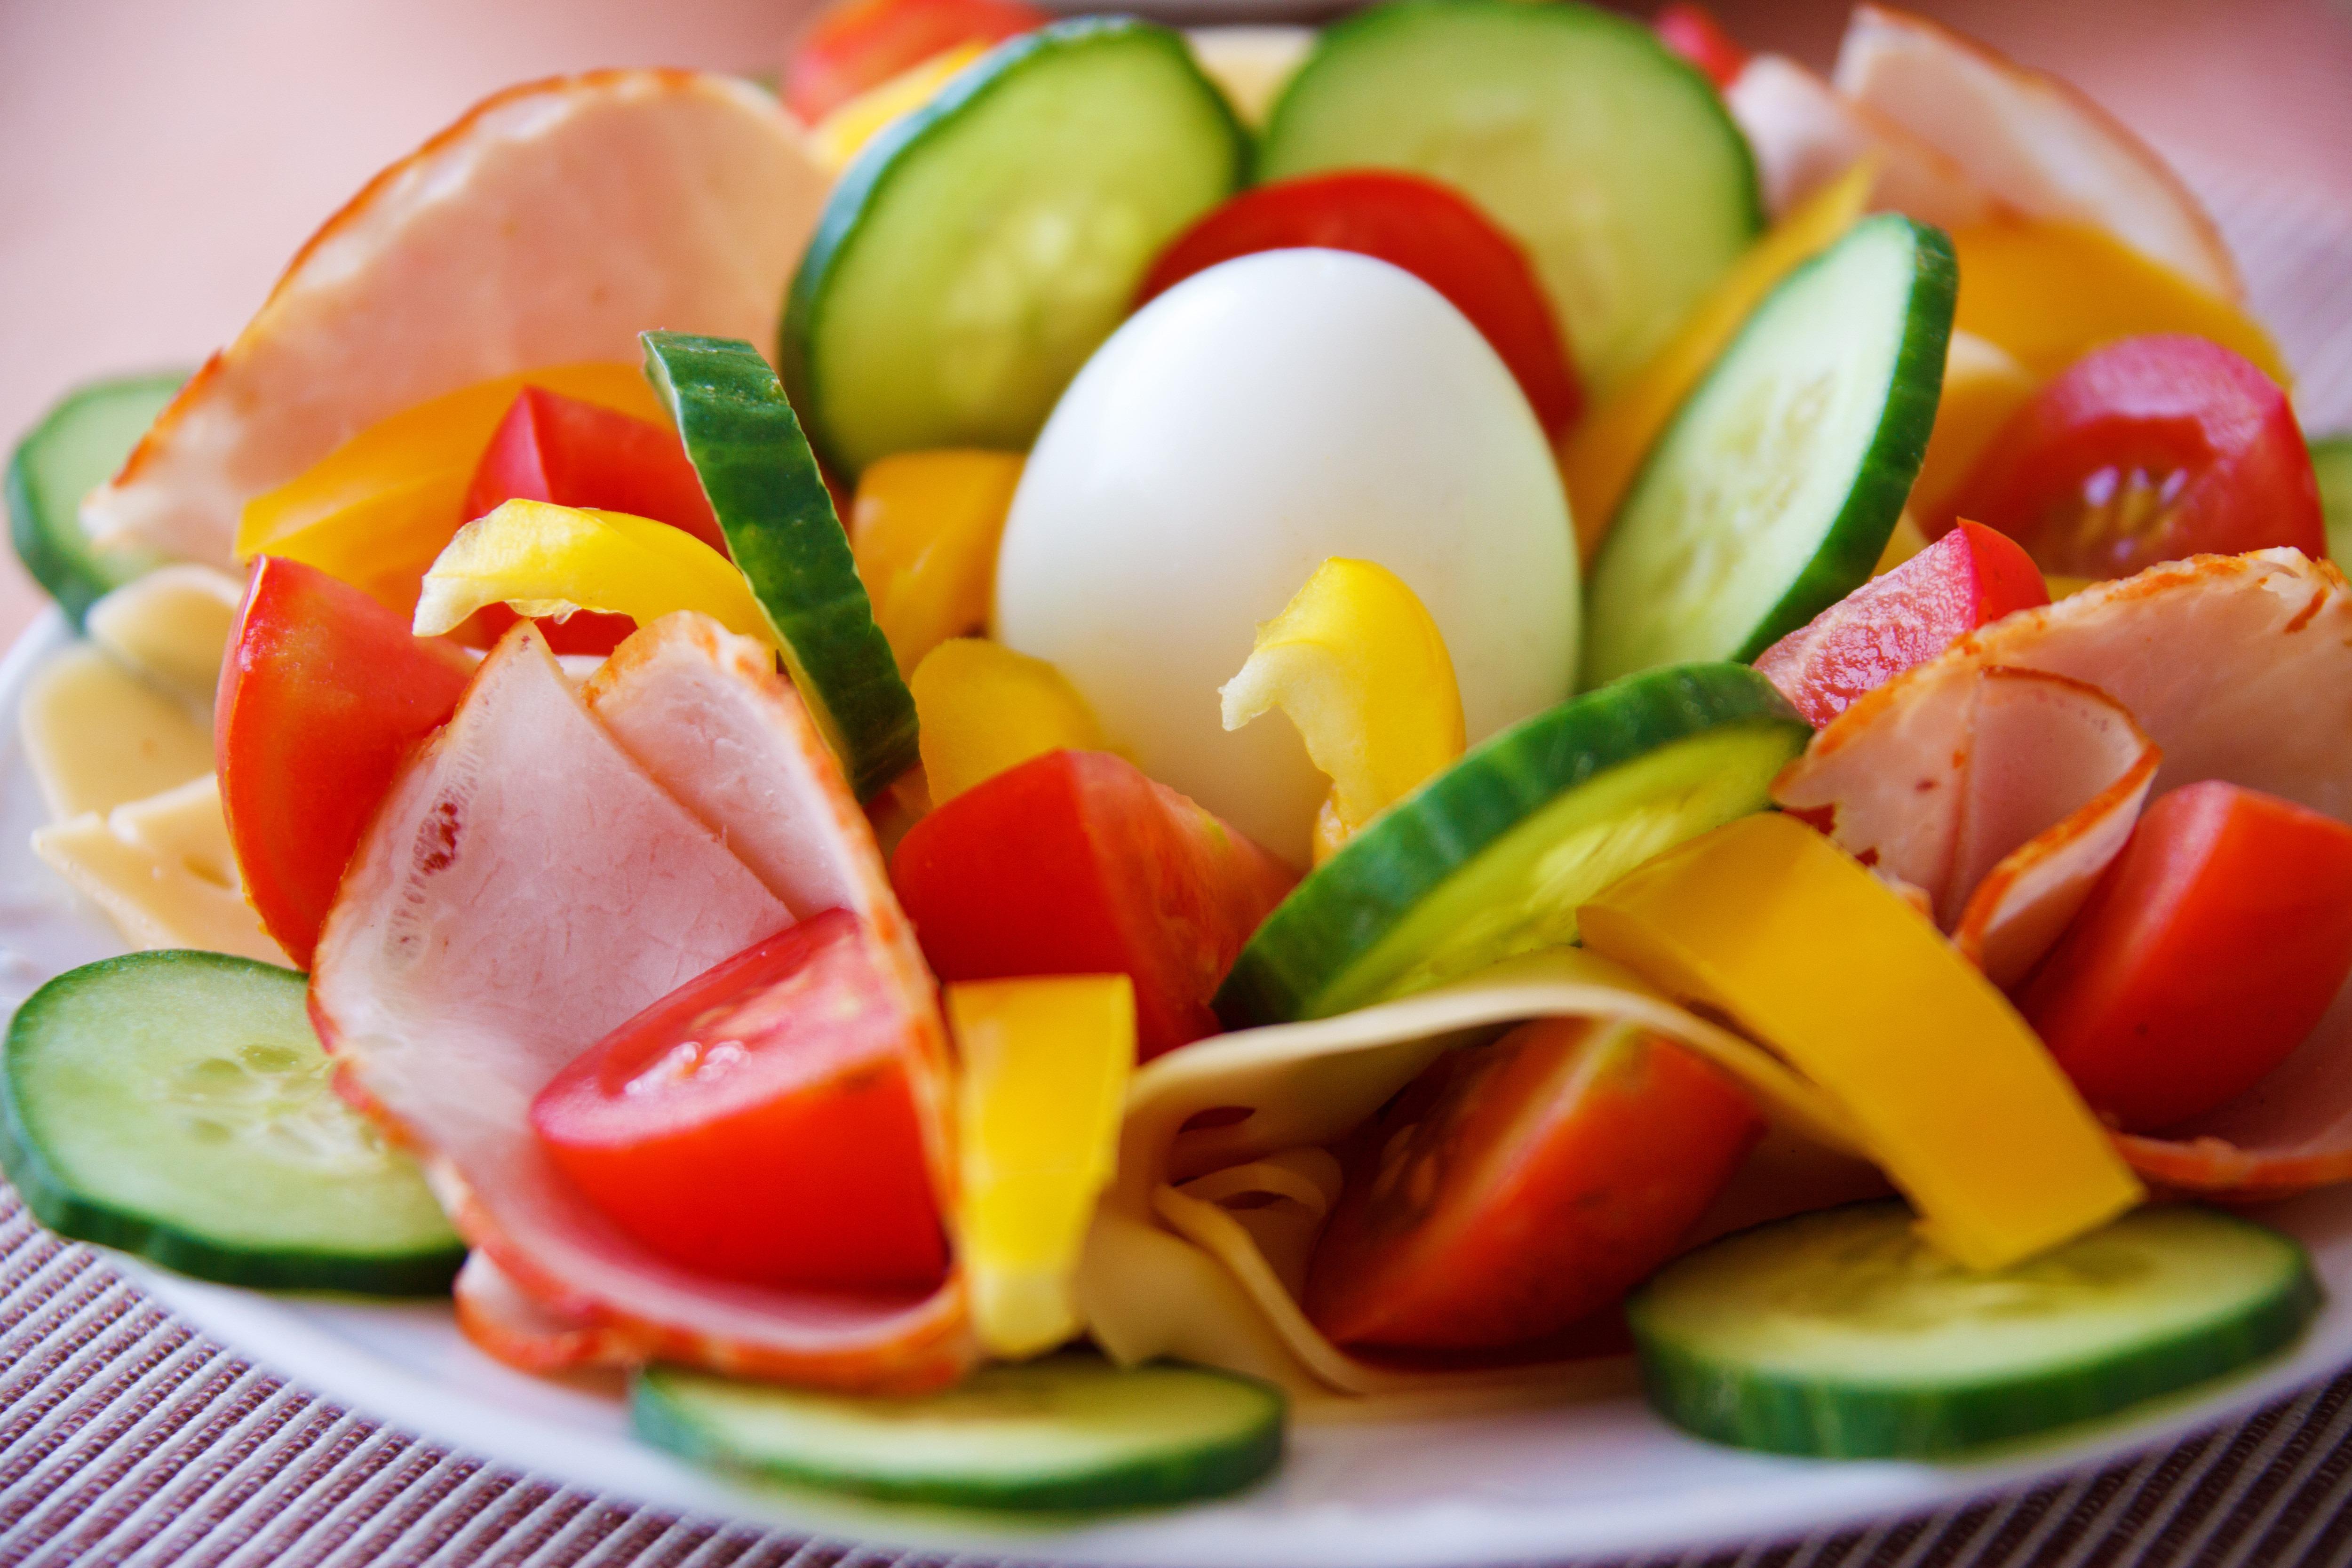 enfermedades cardiovasculares - dieta